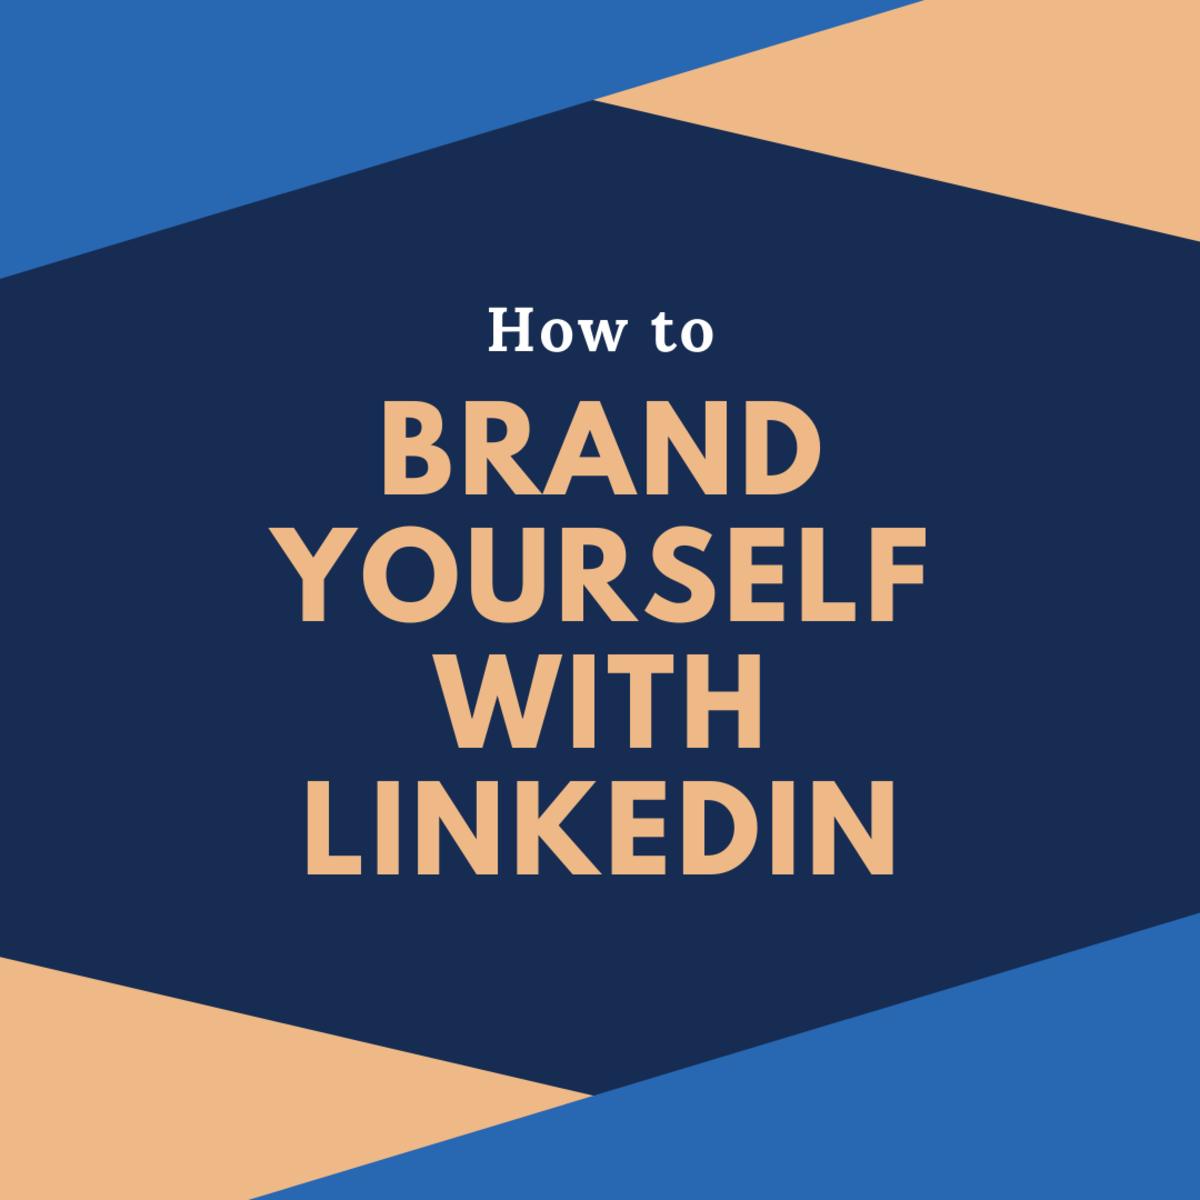 Branding Yourself With LinkedIn